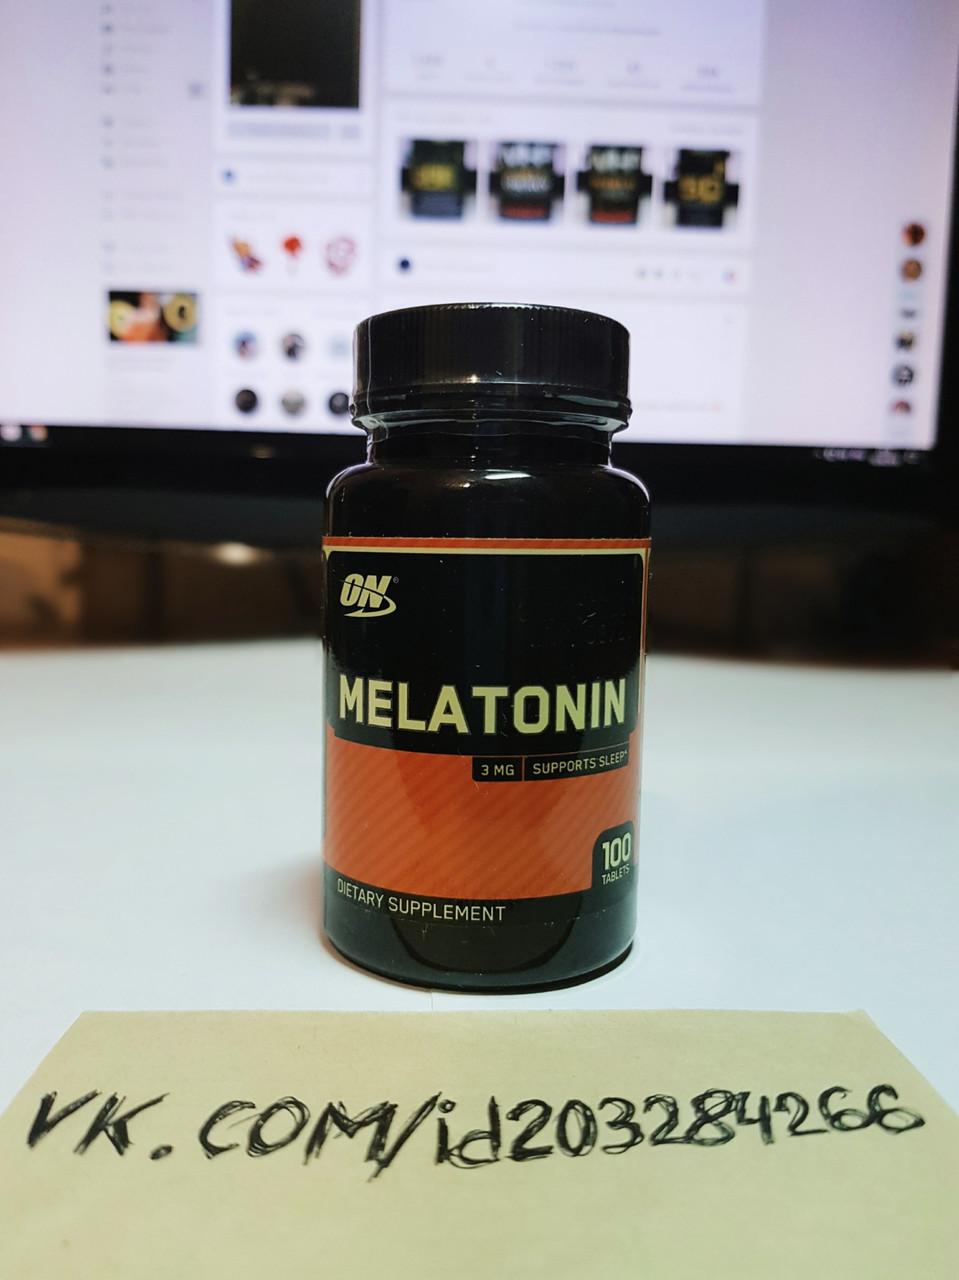 Мелатонин гормон сна Optimum Nutrition Melatonin 100 табл оптимум нутришн